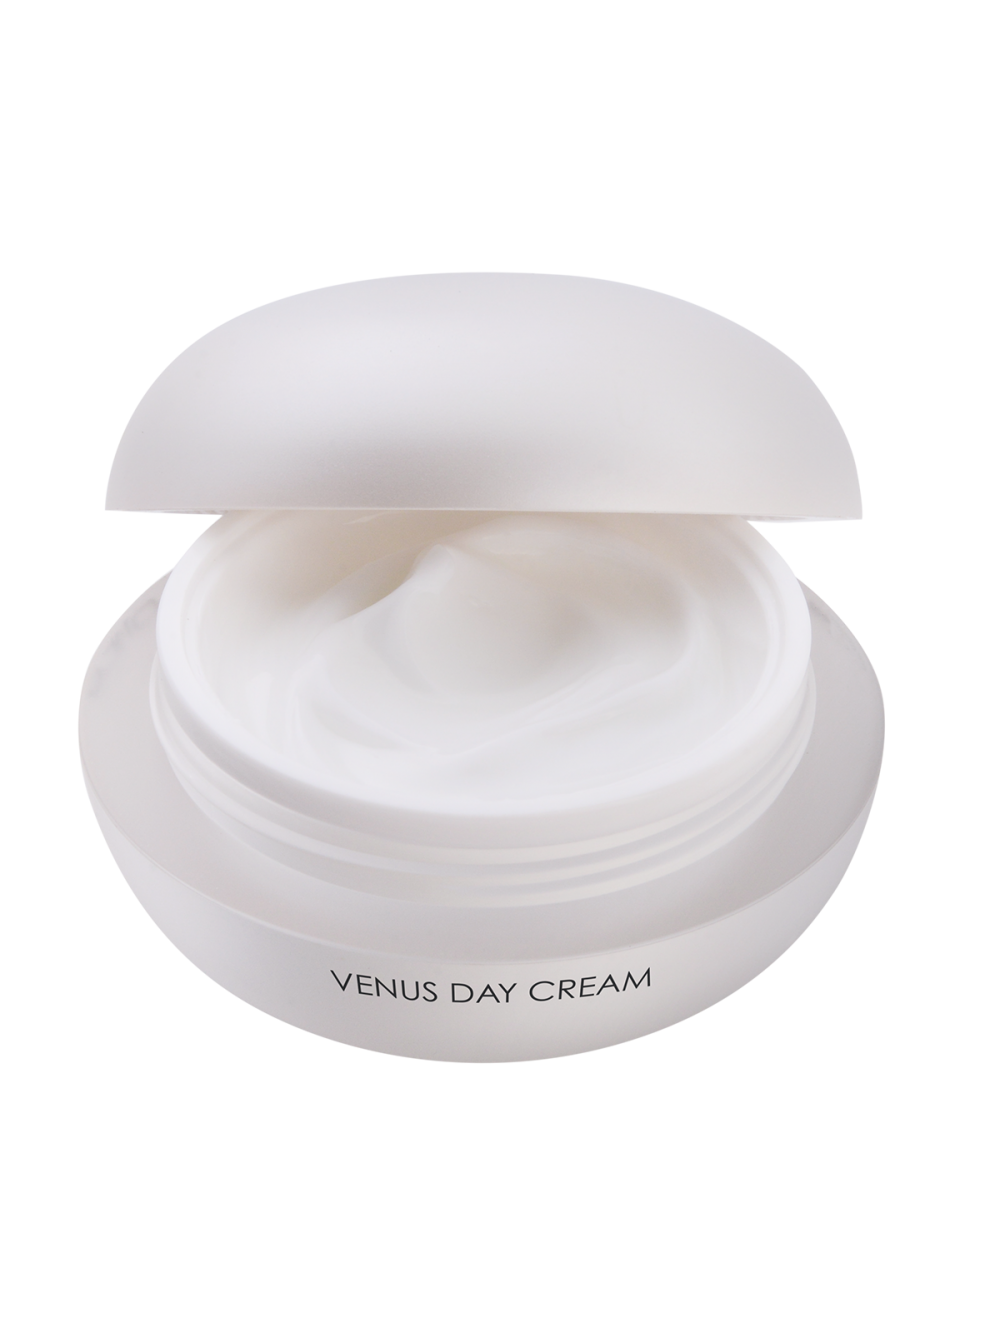 Venus Day Cream with open lid